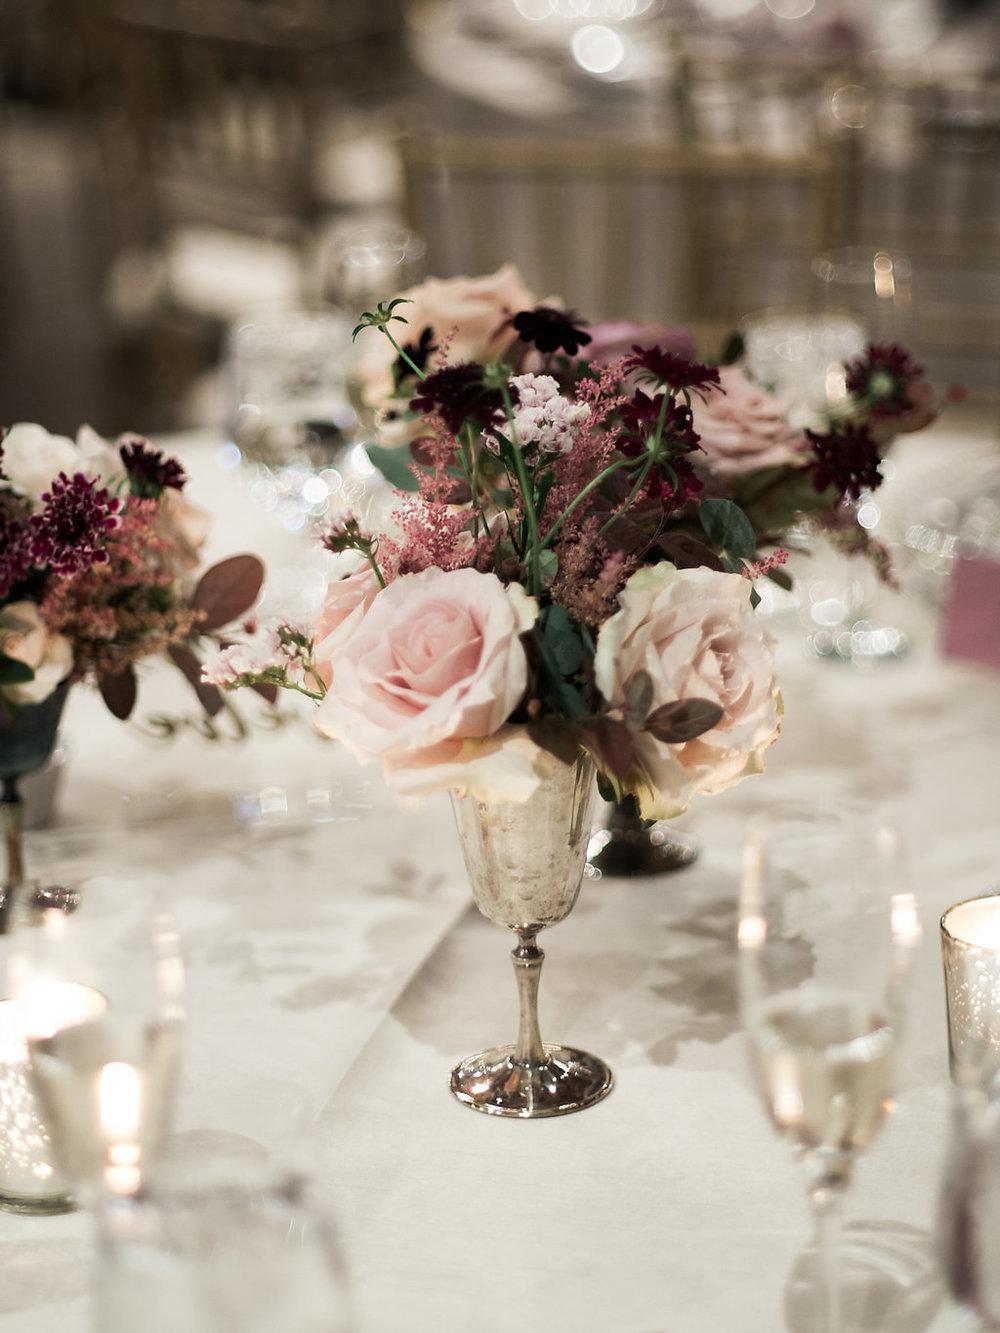 winery-wedding-reception-centerpiece-JennySoiPhotography.jpg